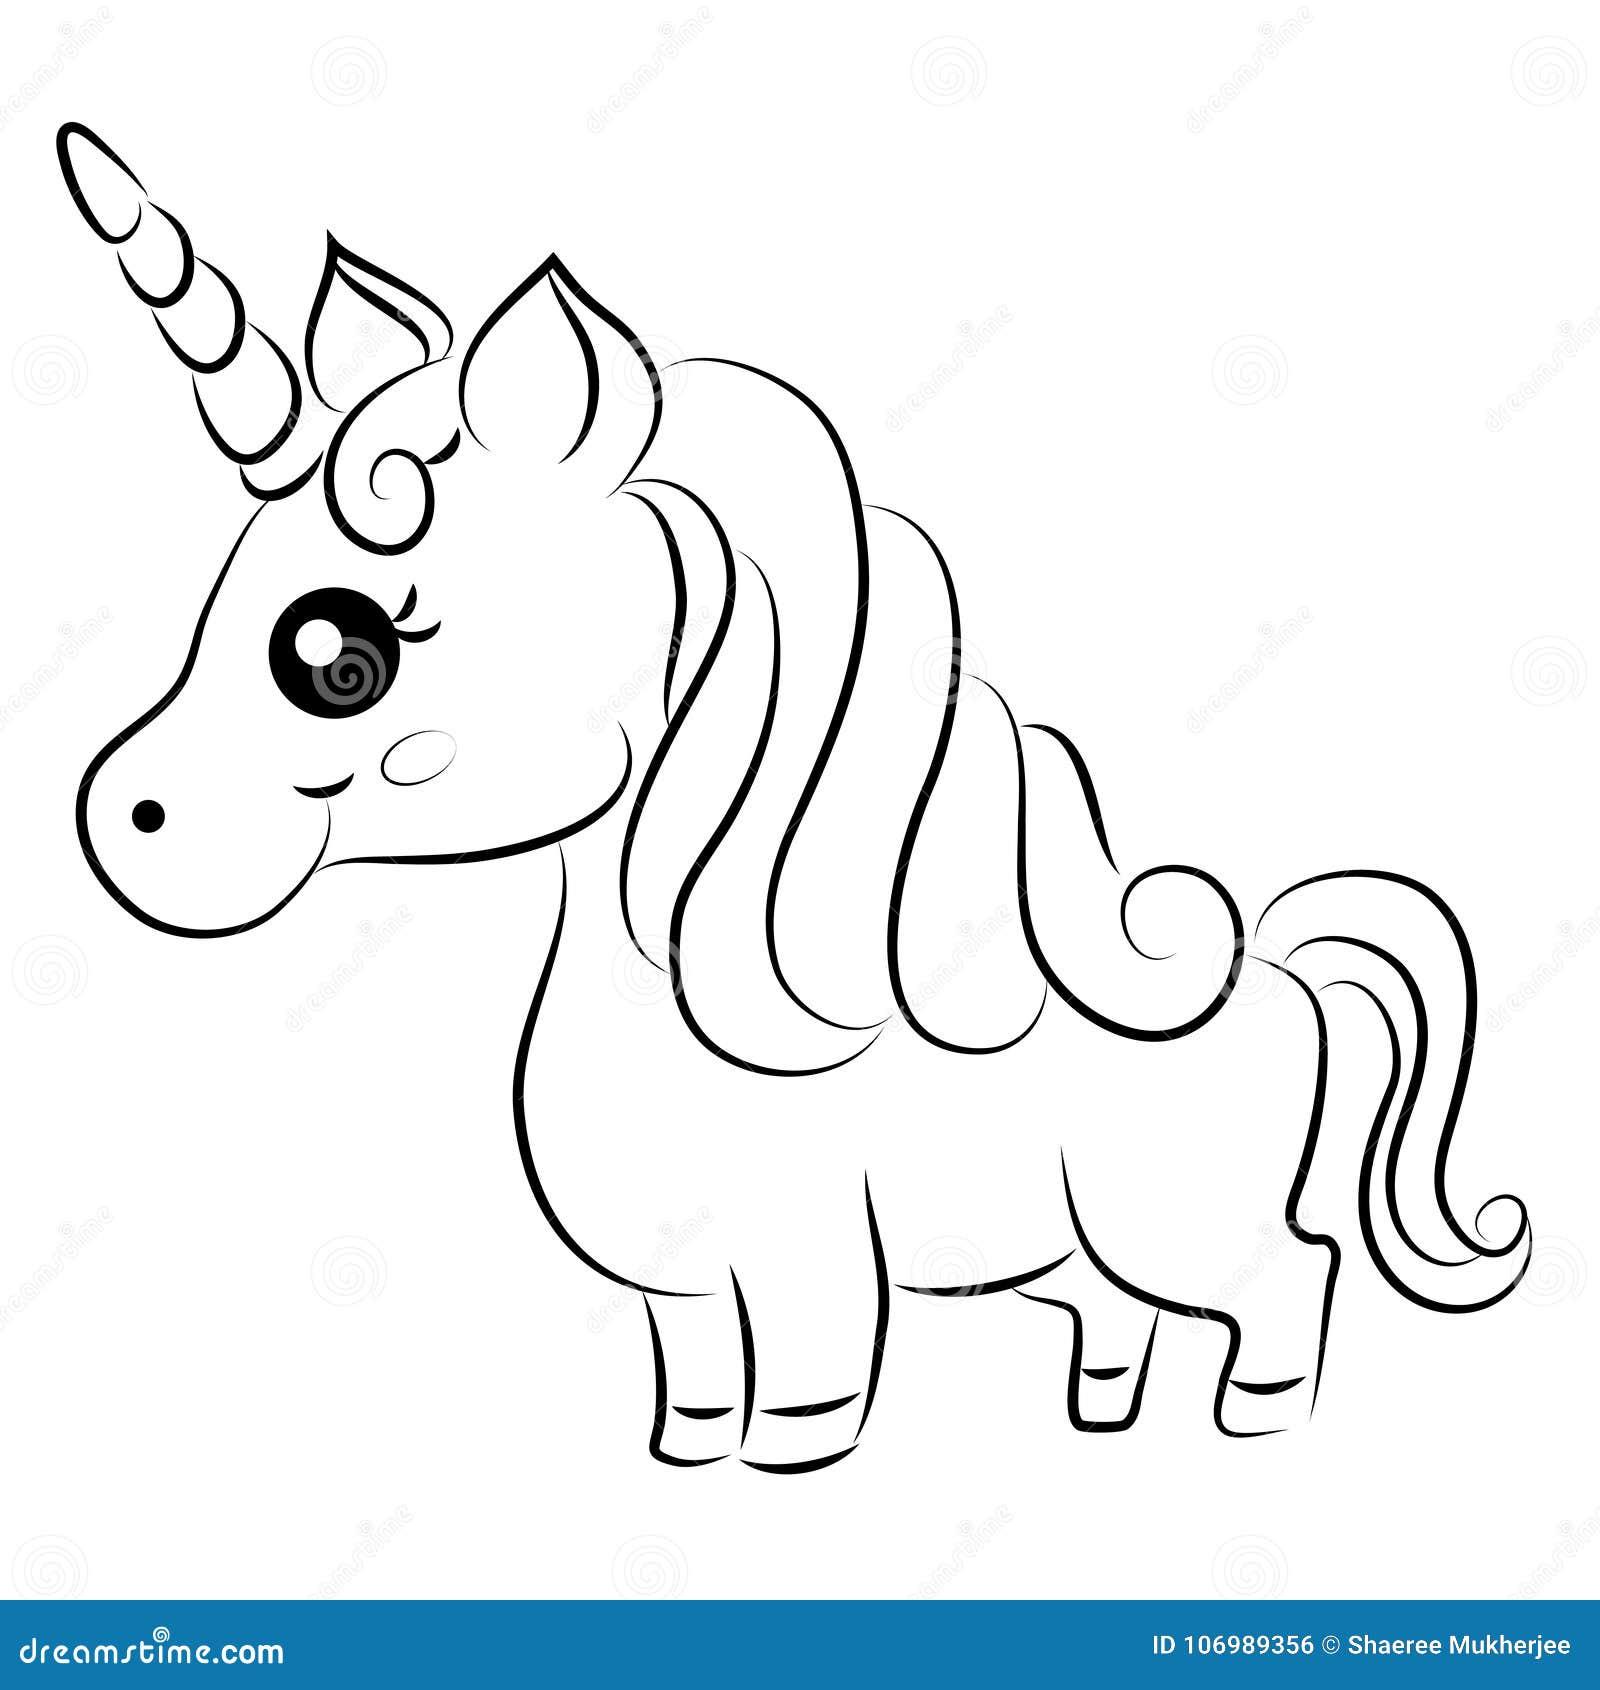 Vecteur Mignon Unicorn Coloring Page De Bande Dessinee